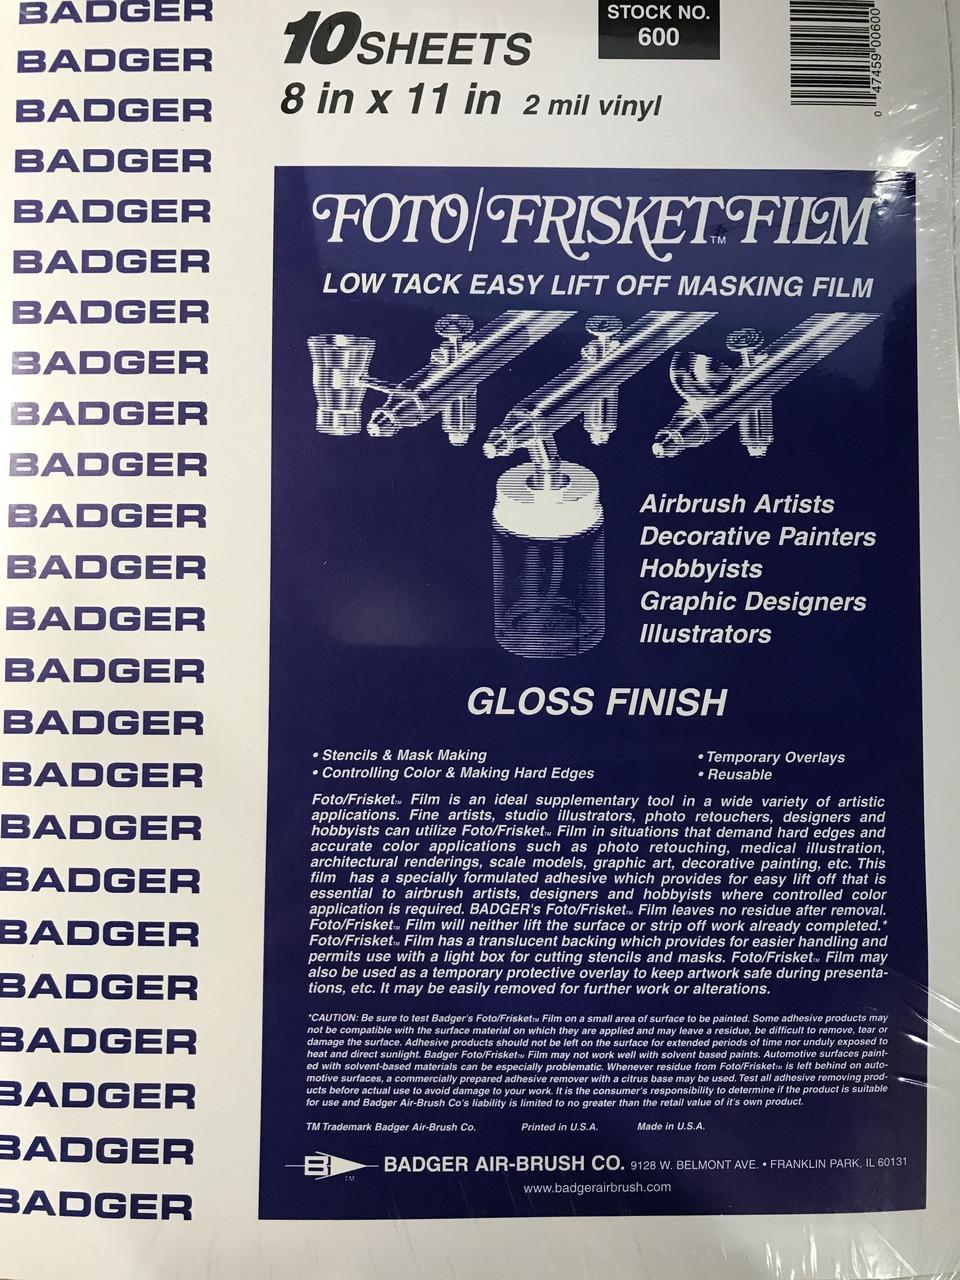 Badger Foto/Frisket film Gloss finish